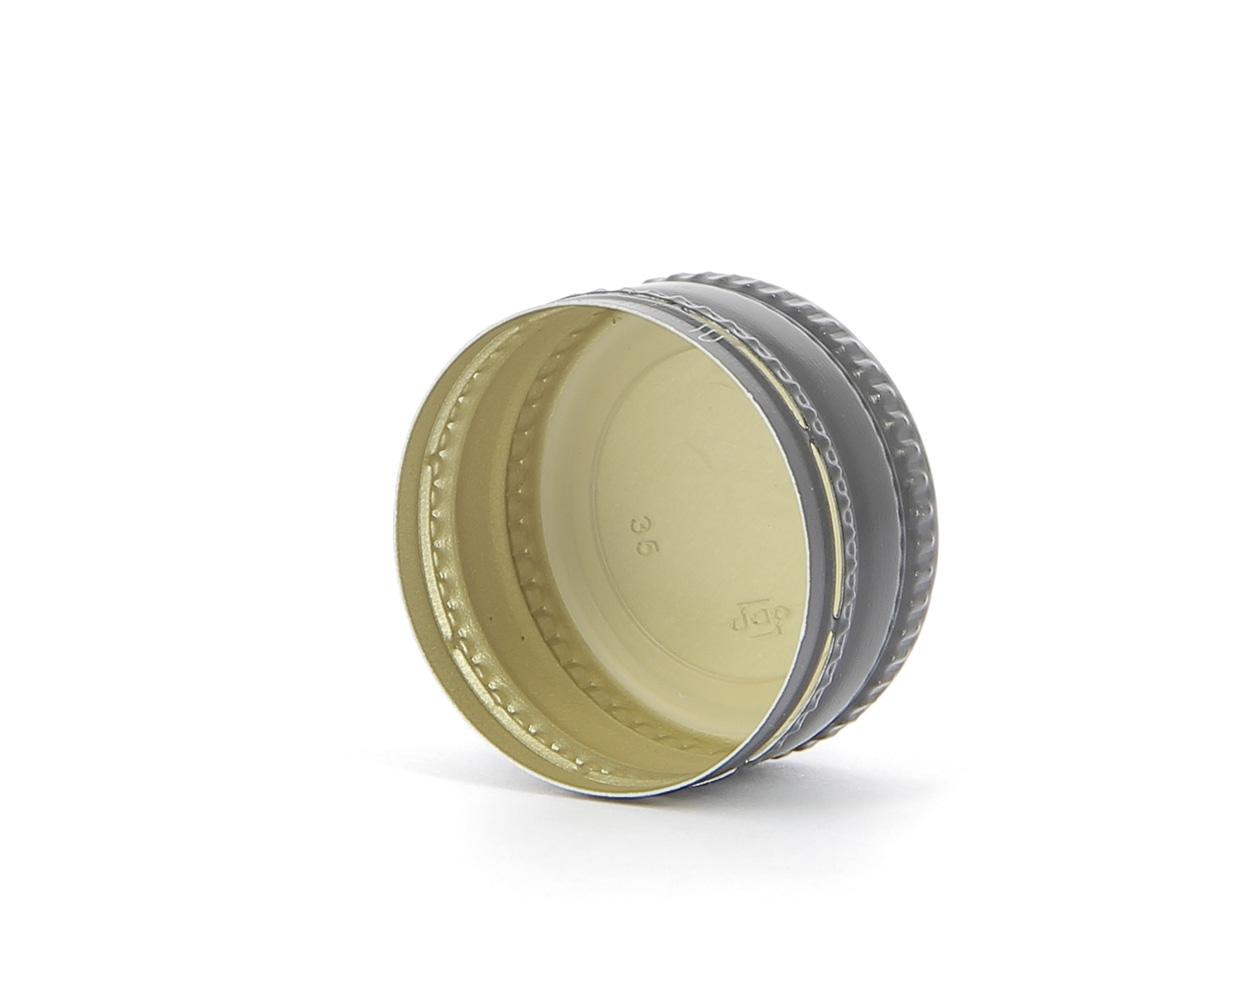 ROPP 28X15 Aluminium cap: on top of the airtightness closures